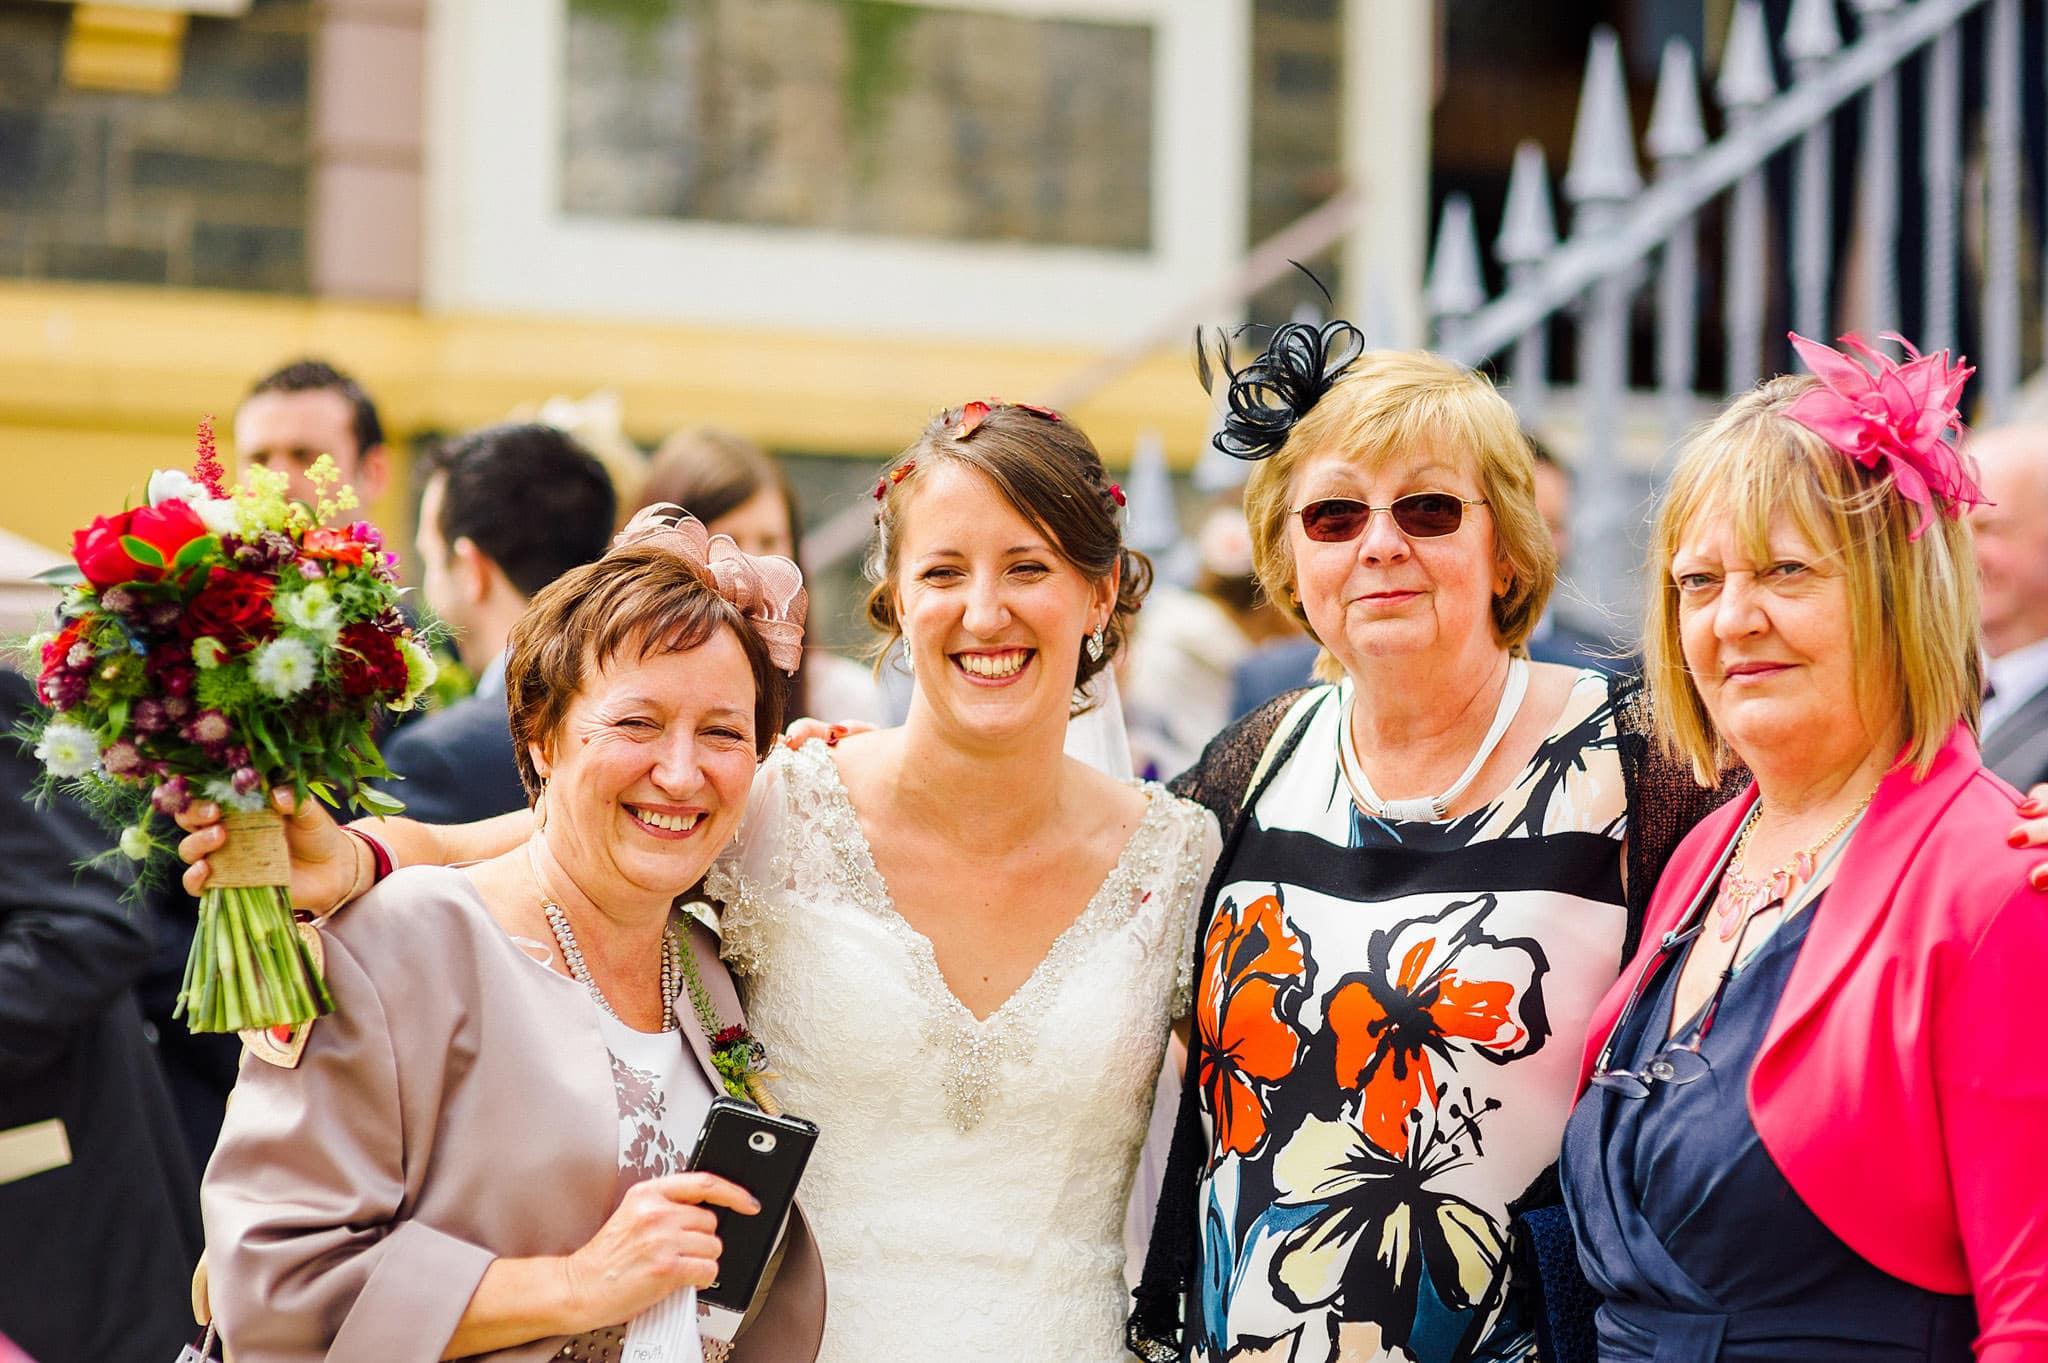 wedding-photographer-aberystwyth-wales (84)